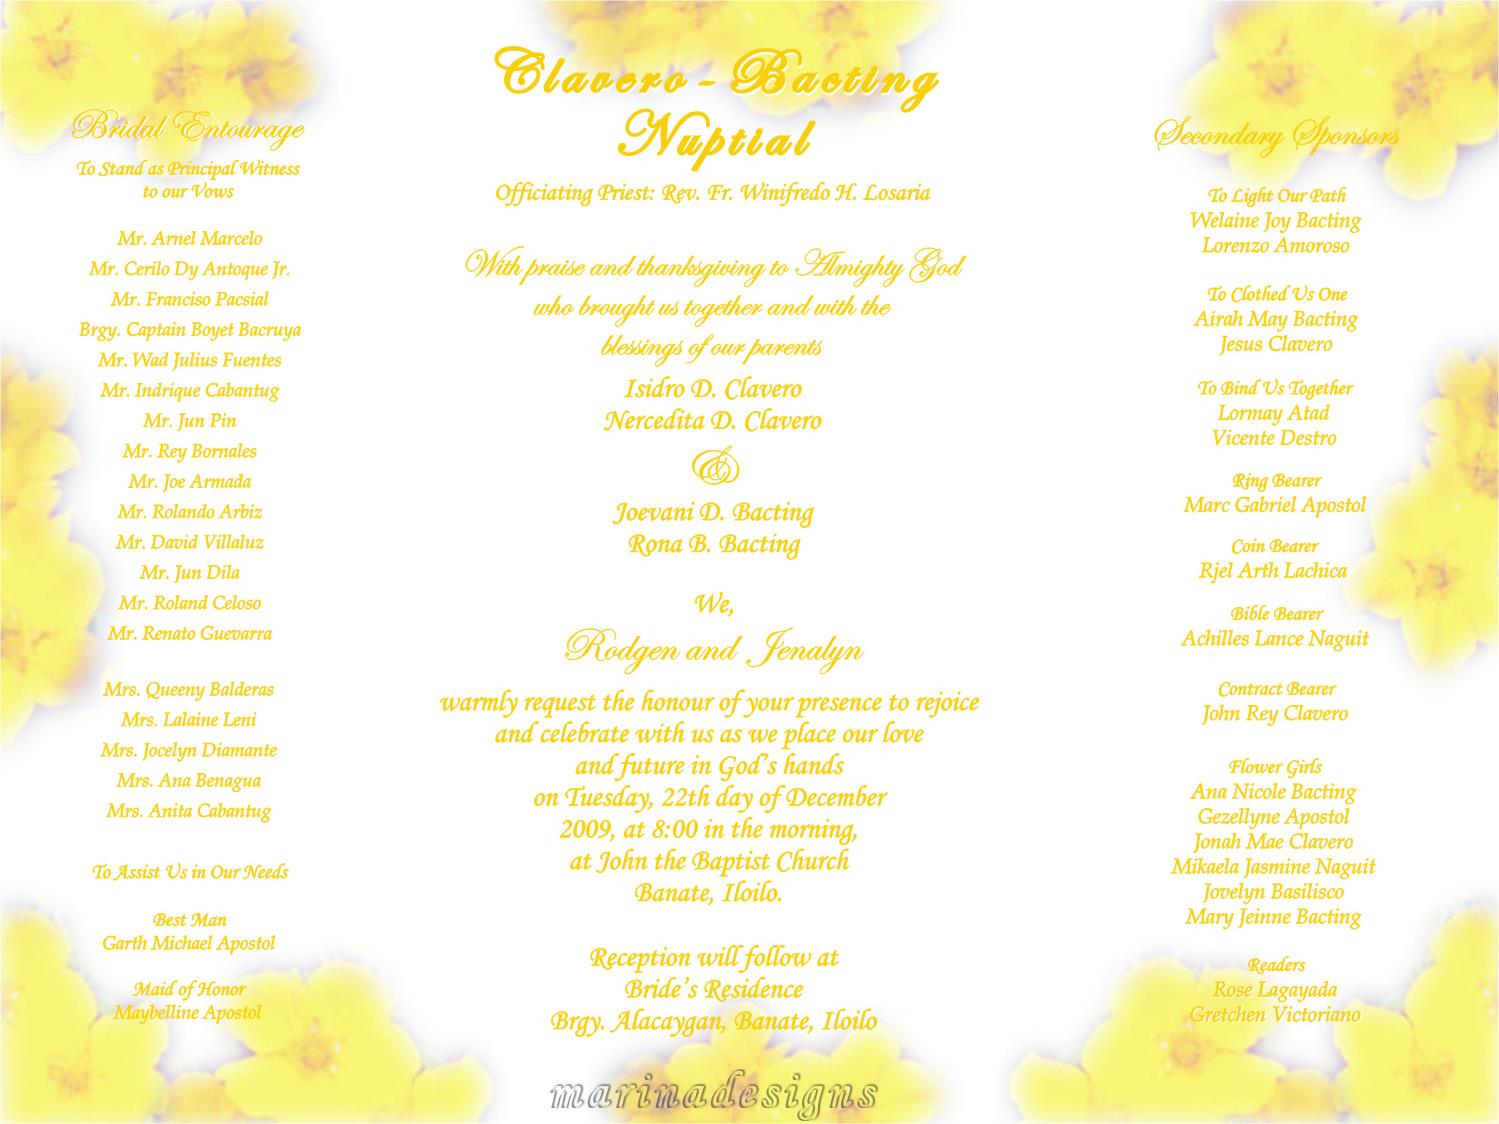 Principal sponsor wedding invitation paperinvite graphic designs mar desktop wedding invitation stopboris Gallery